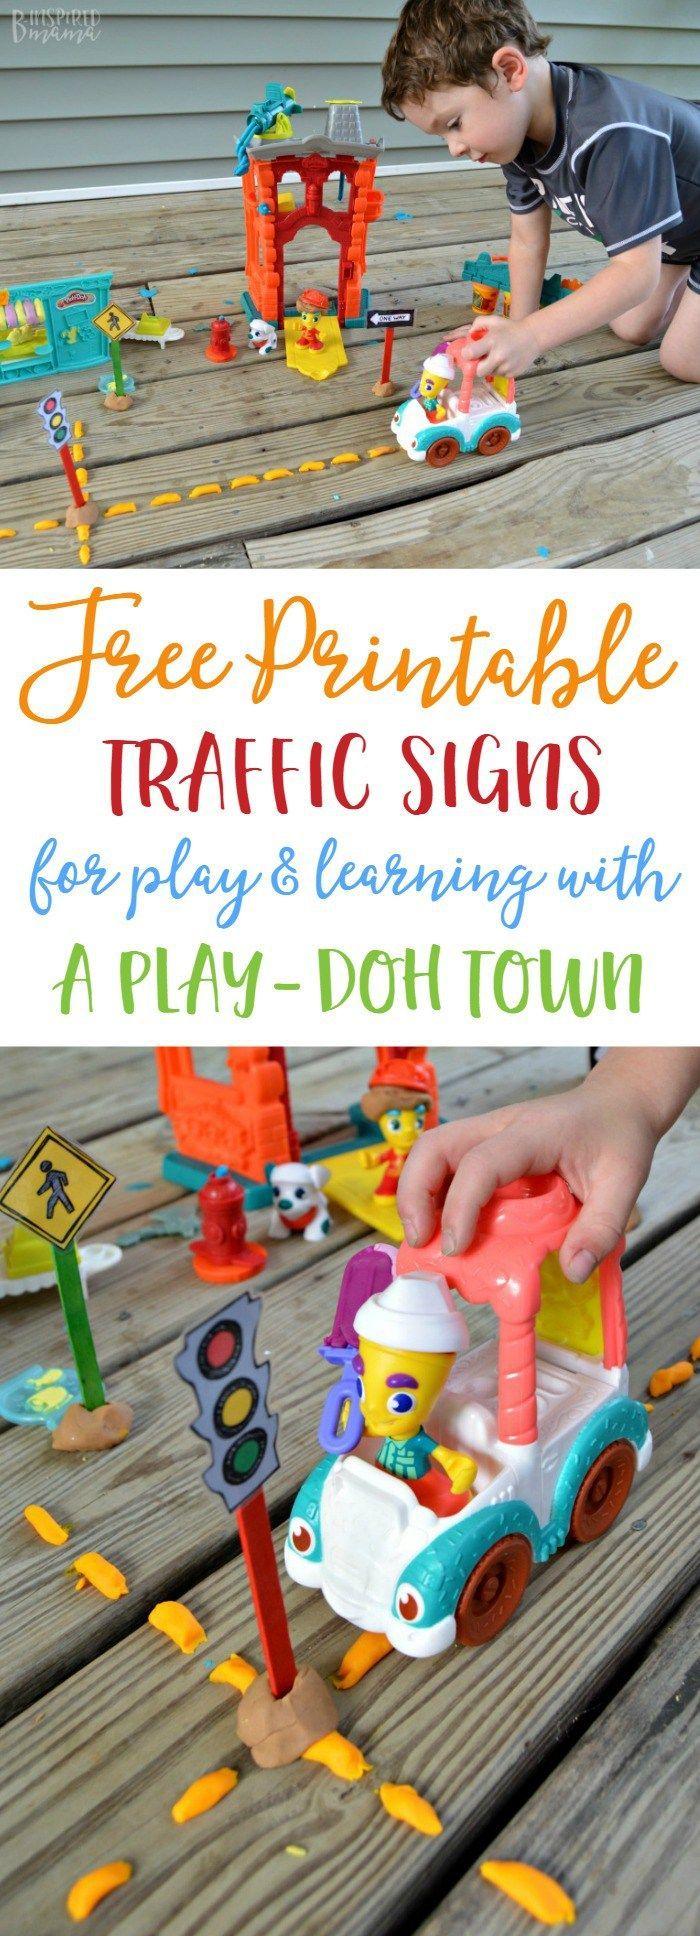 399 best transportation activities for kids images on pinterest